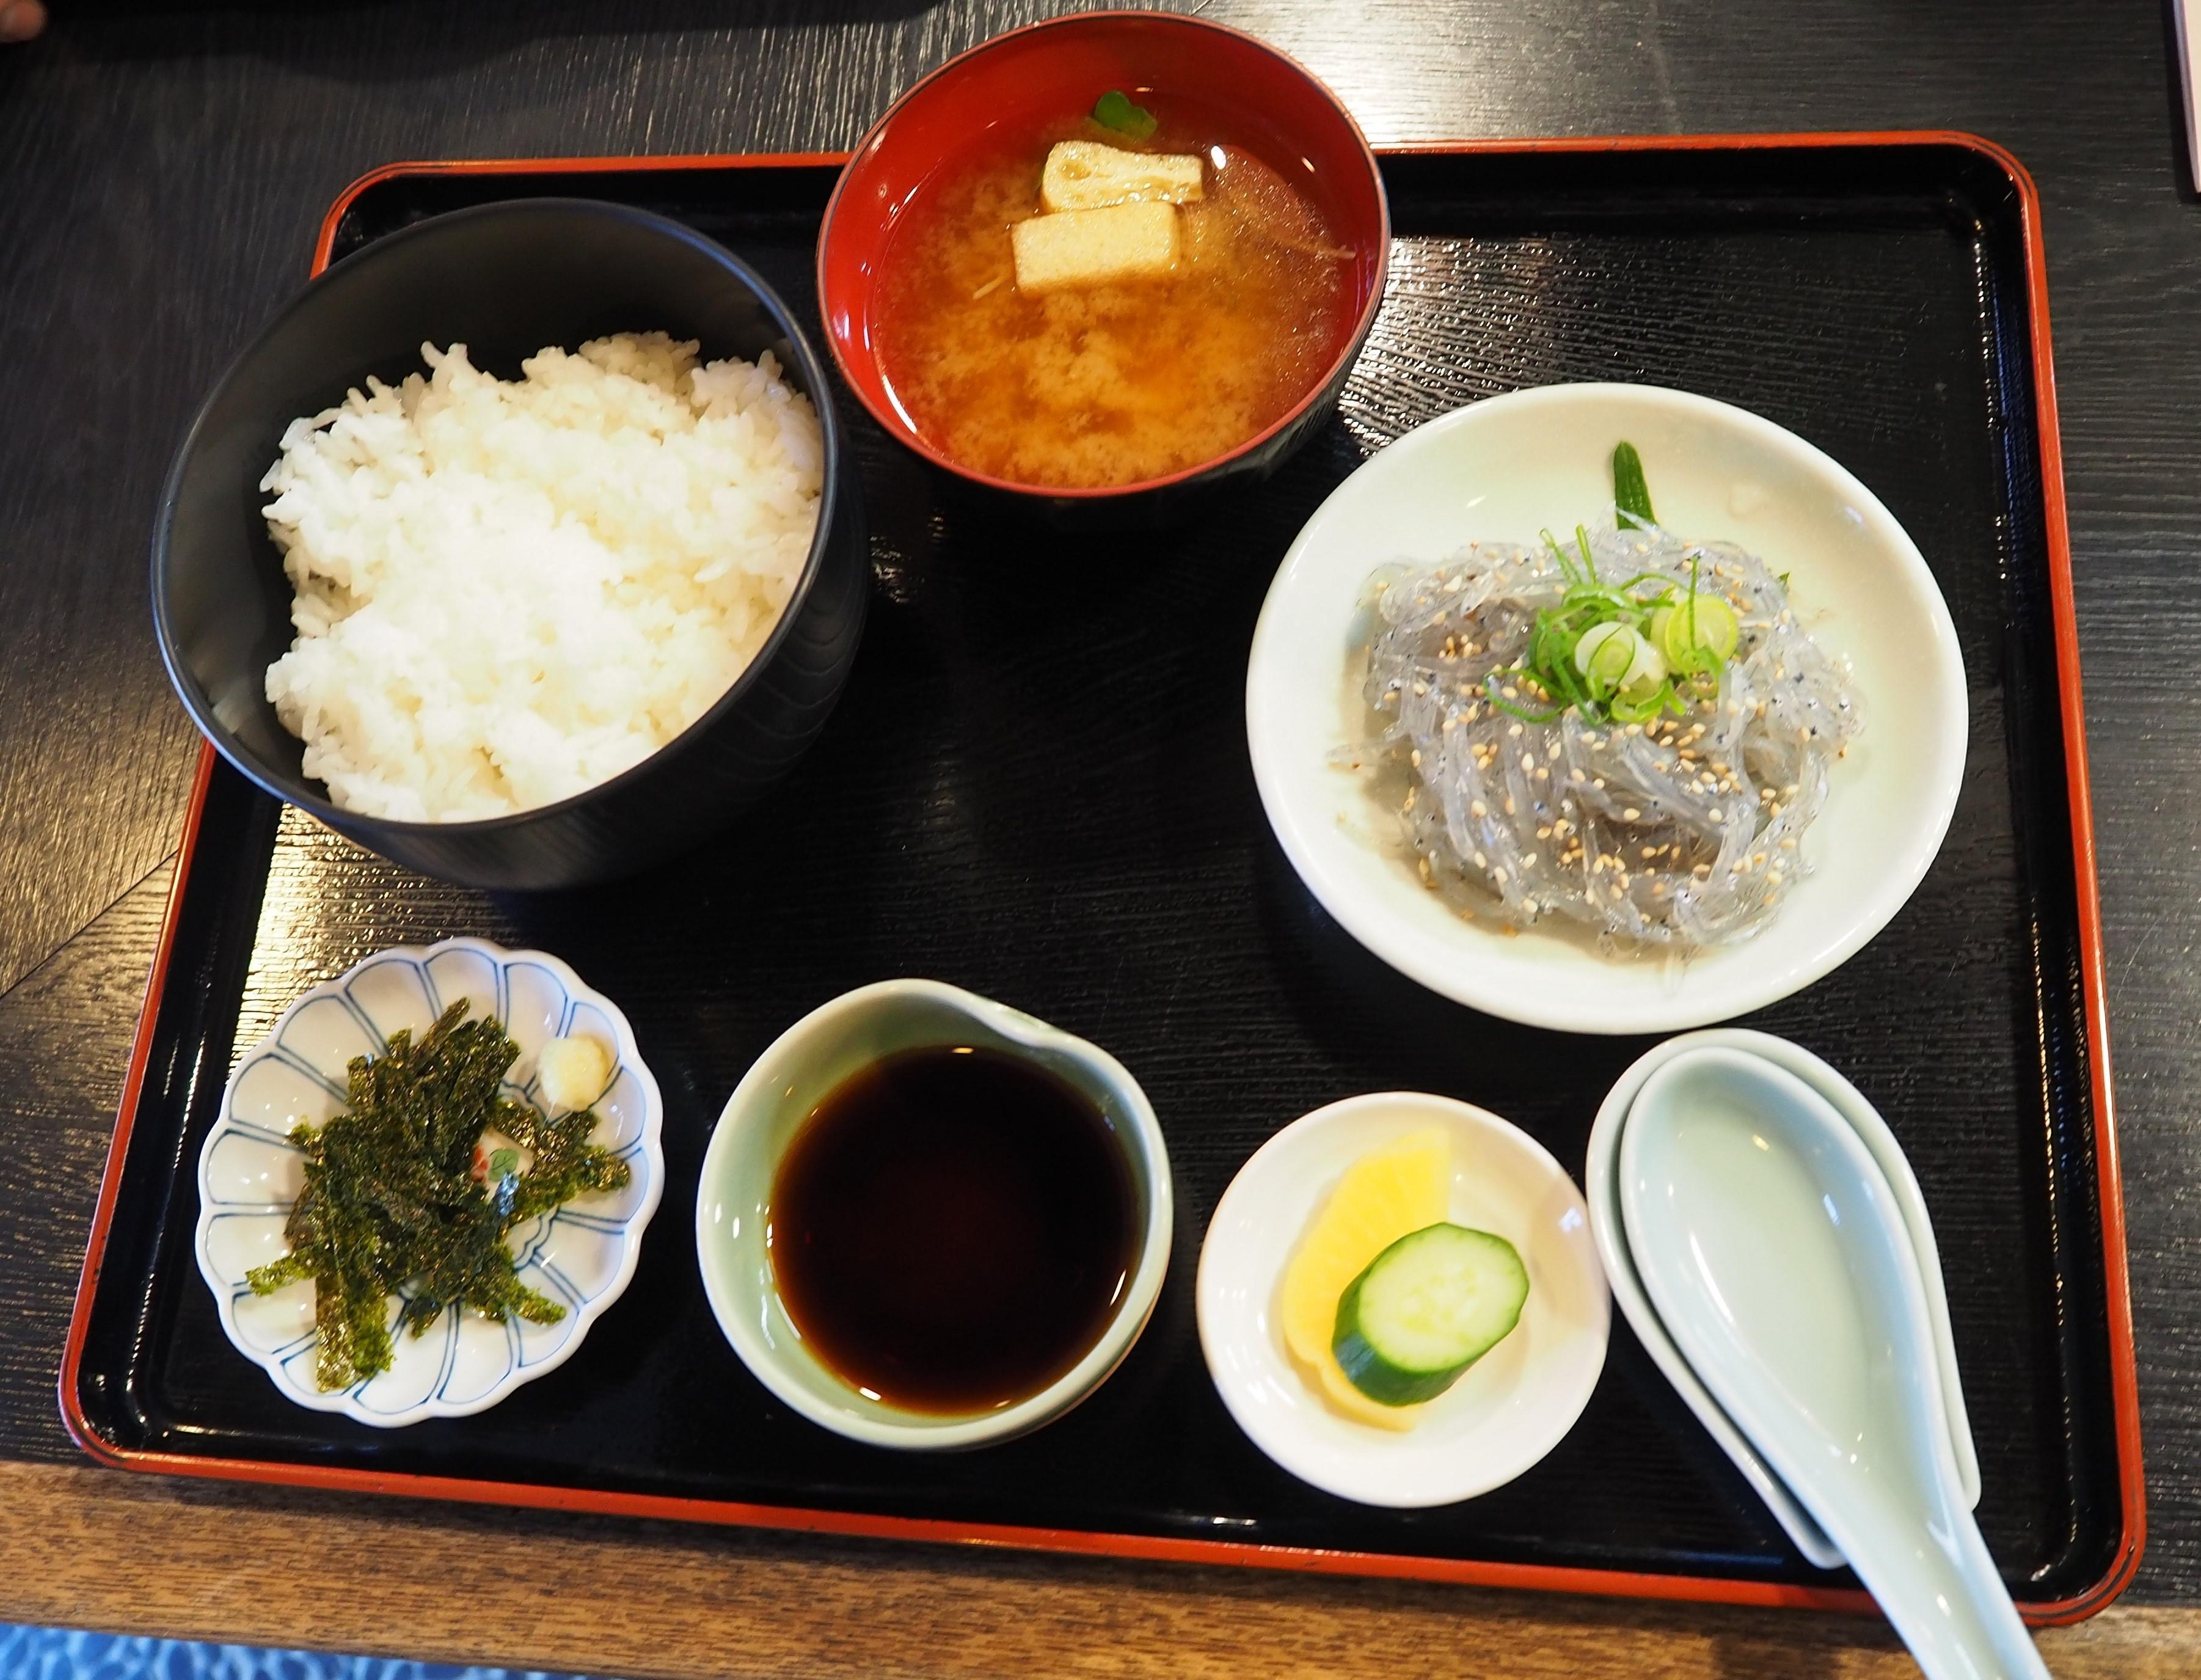 harleydavidson-motorcycle-touring-blog-wakayama-yuasatown-kadoya-diningroom-rawwhitebaitbowl.jpg